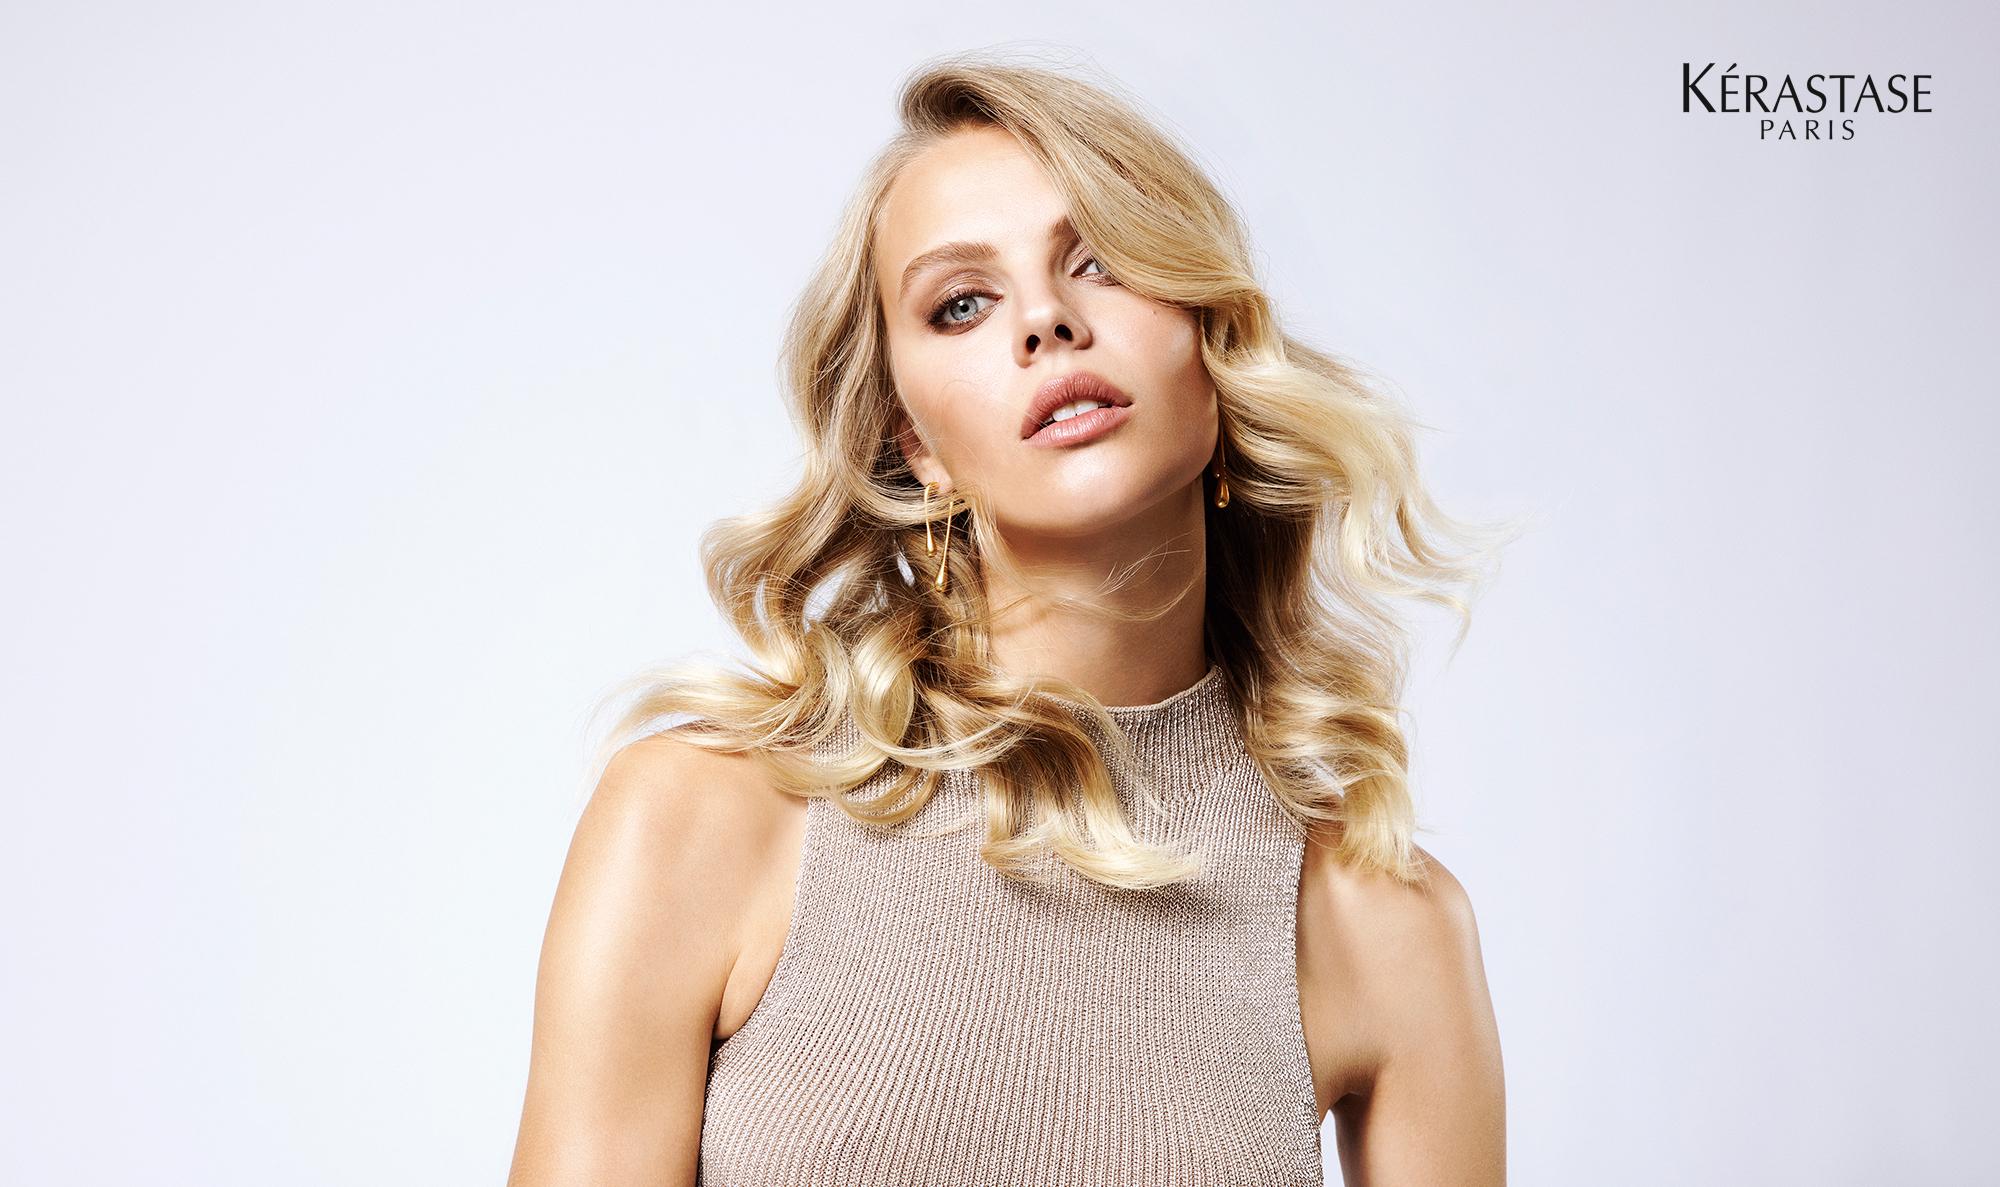 Kérastase Blond Campaign